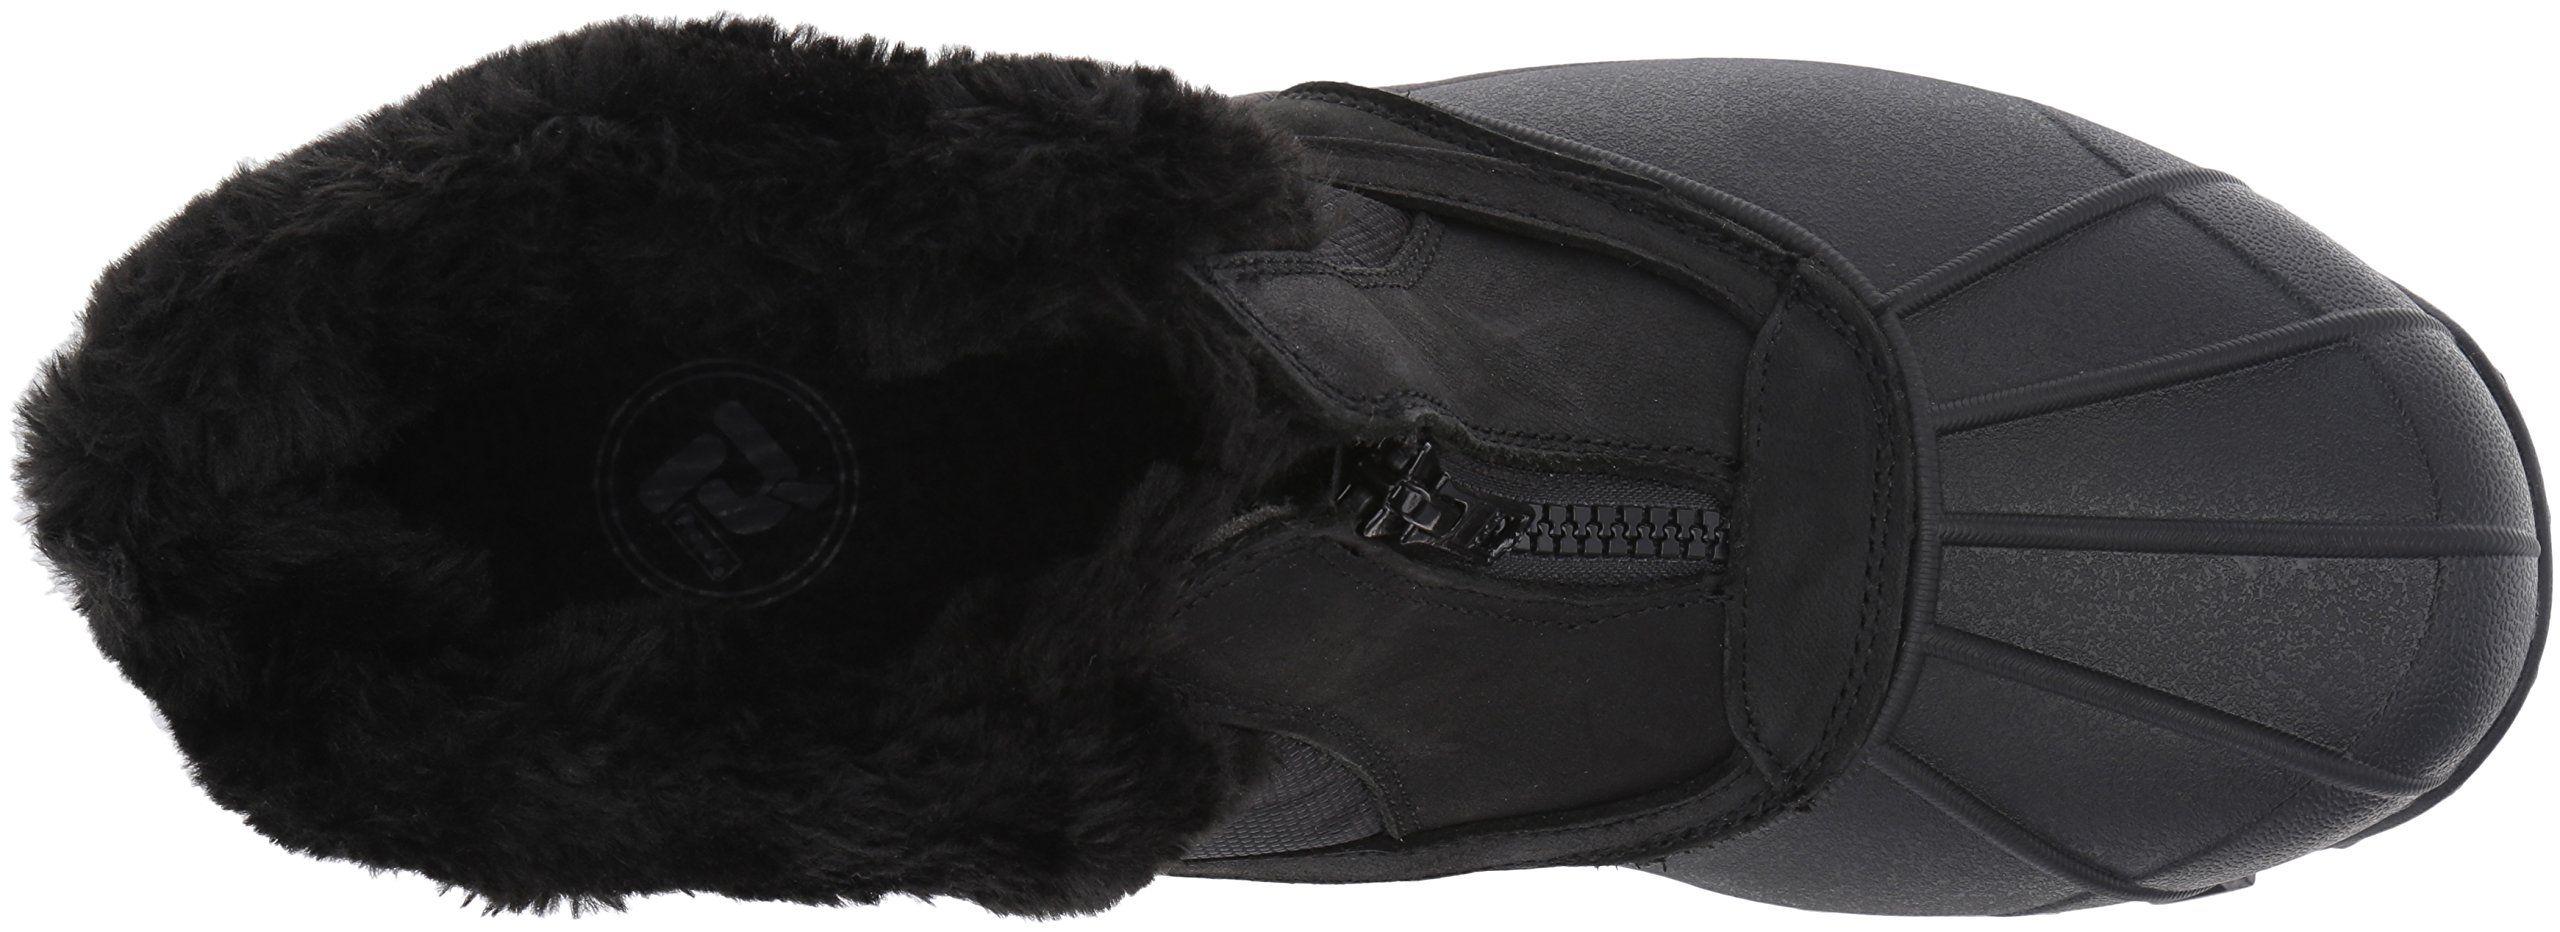 609d716714016c Propet Womens Blizzard Ankle Zip Ii Winter Boot Black Nylon 9 M US ...